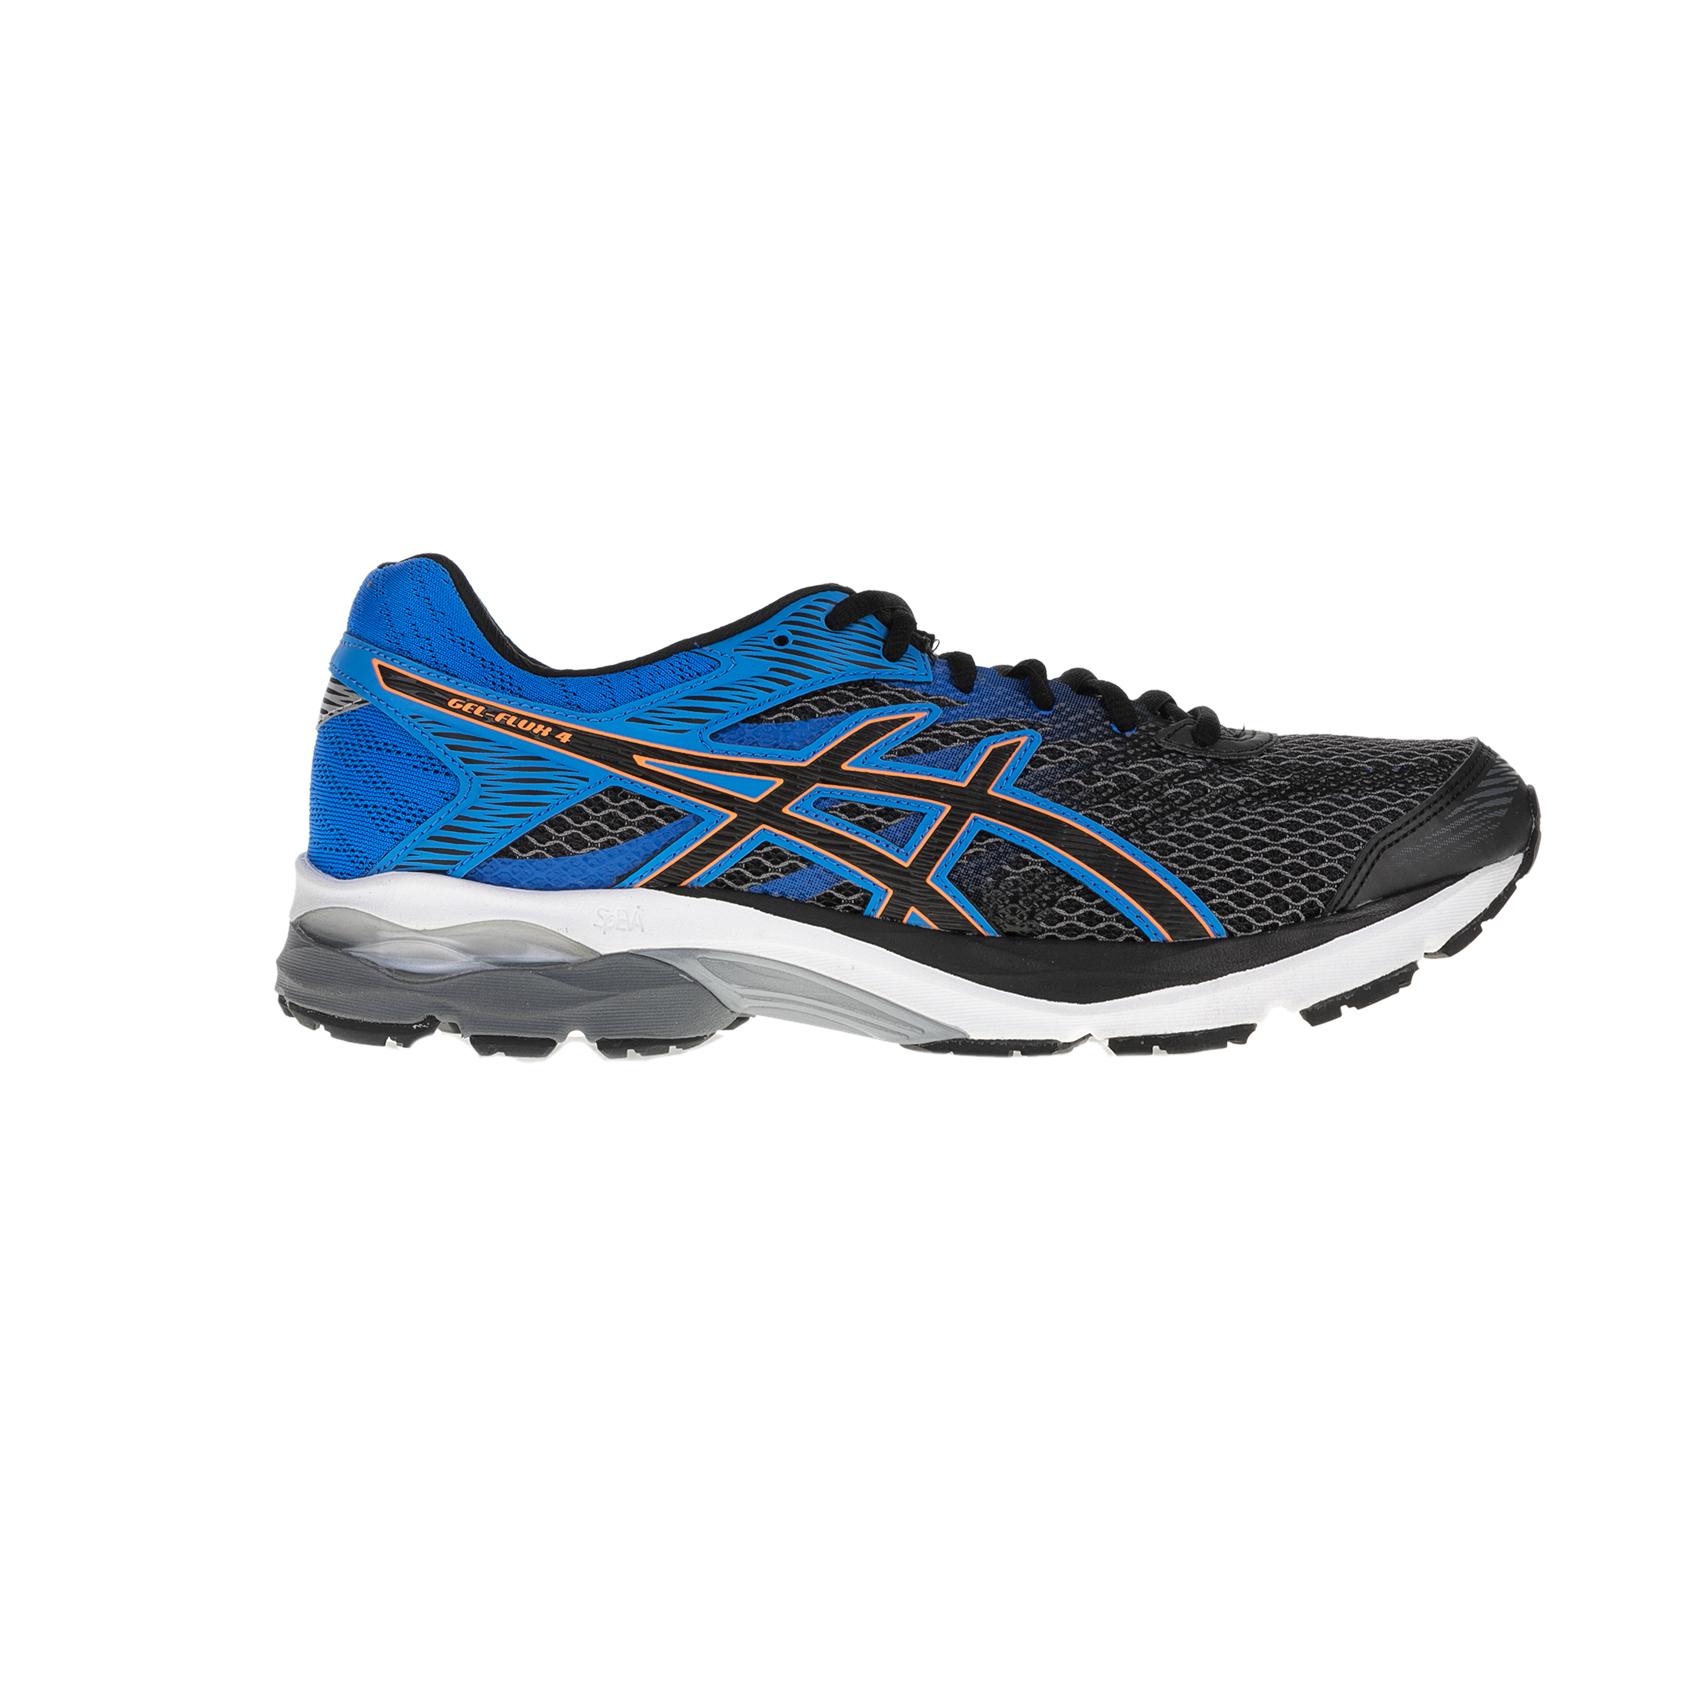 ASICS – Ανδρικά παπούτσια Asics GEL-FLUX 4 μαύρα-μπλε